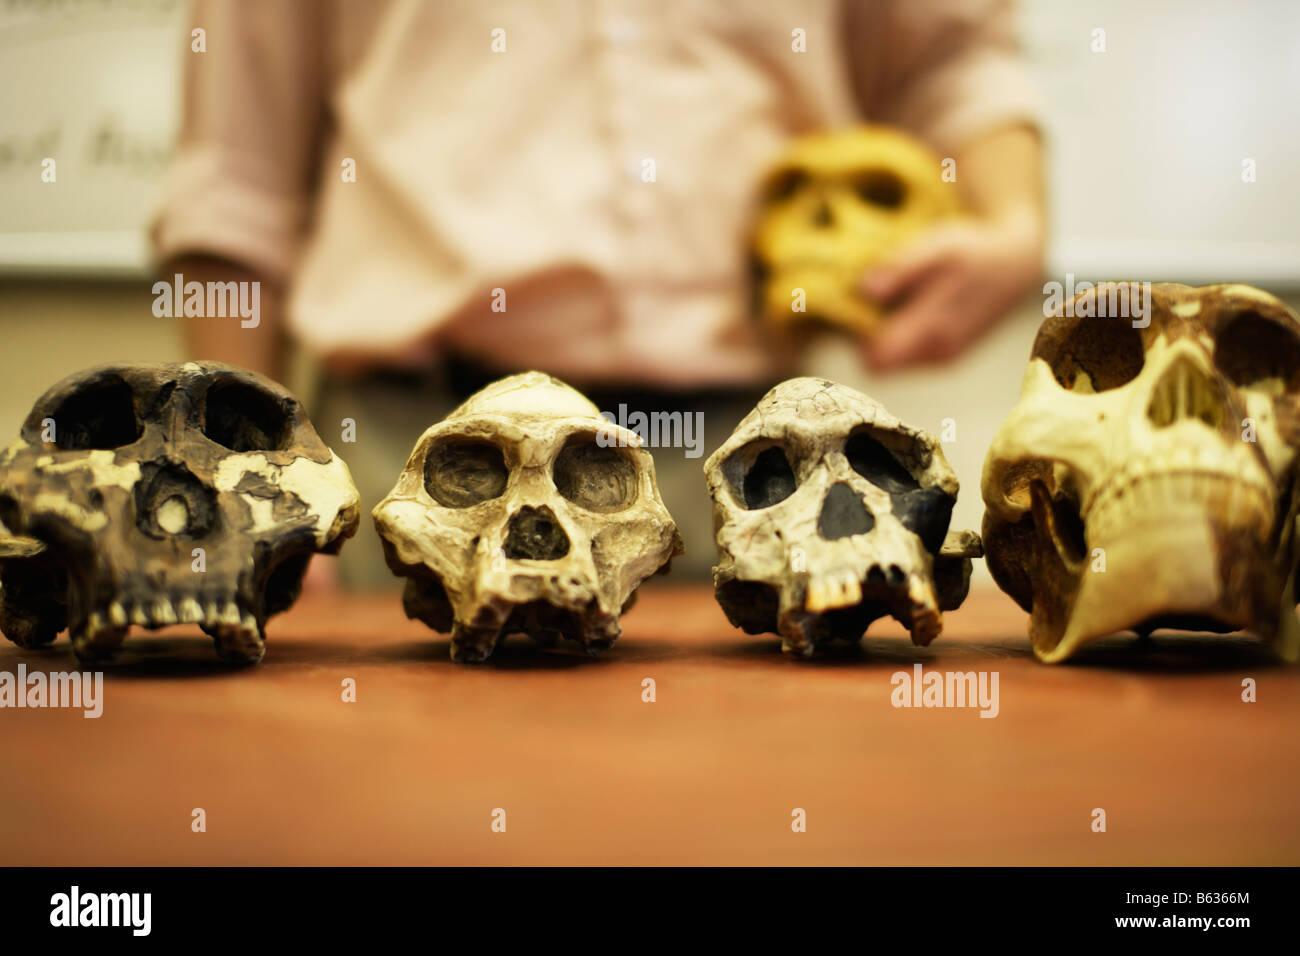 Man teaching human evolution with model skulls of human ancestors - Stock Image